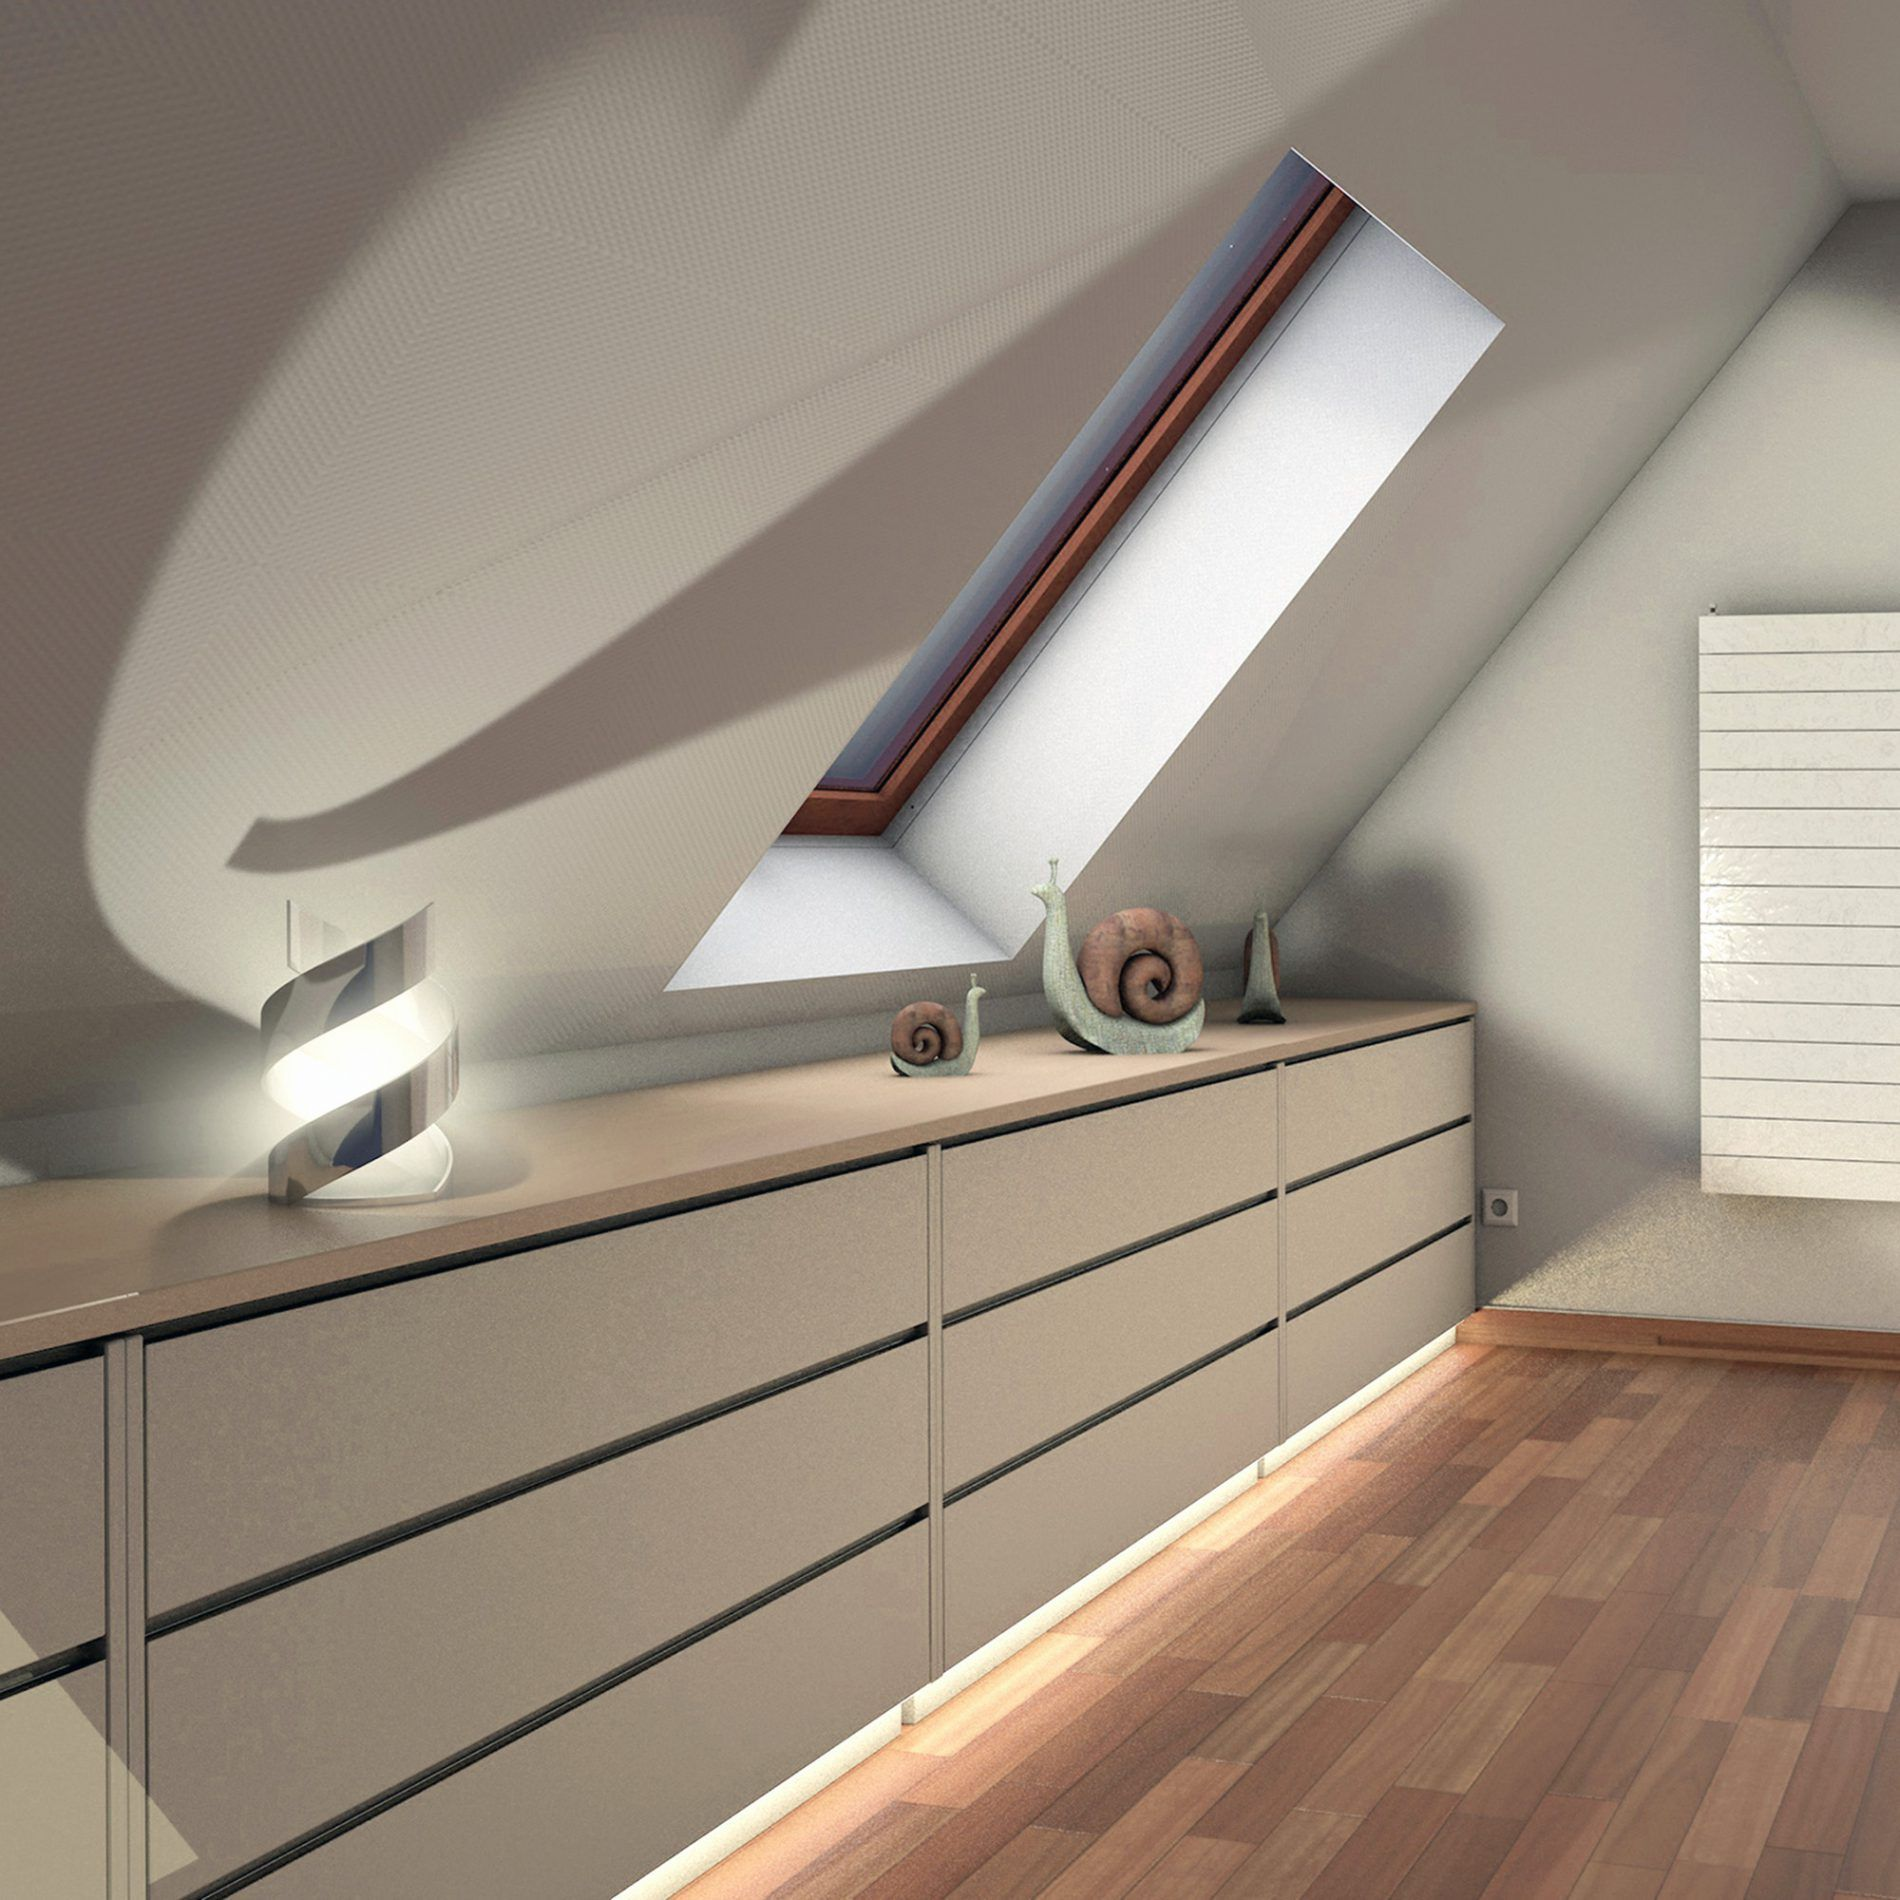 20 Dach Erneuerung / Ausbau Ideen   dach, dachboden renovierung ...